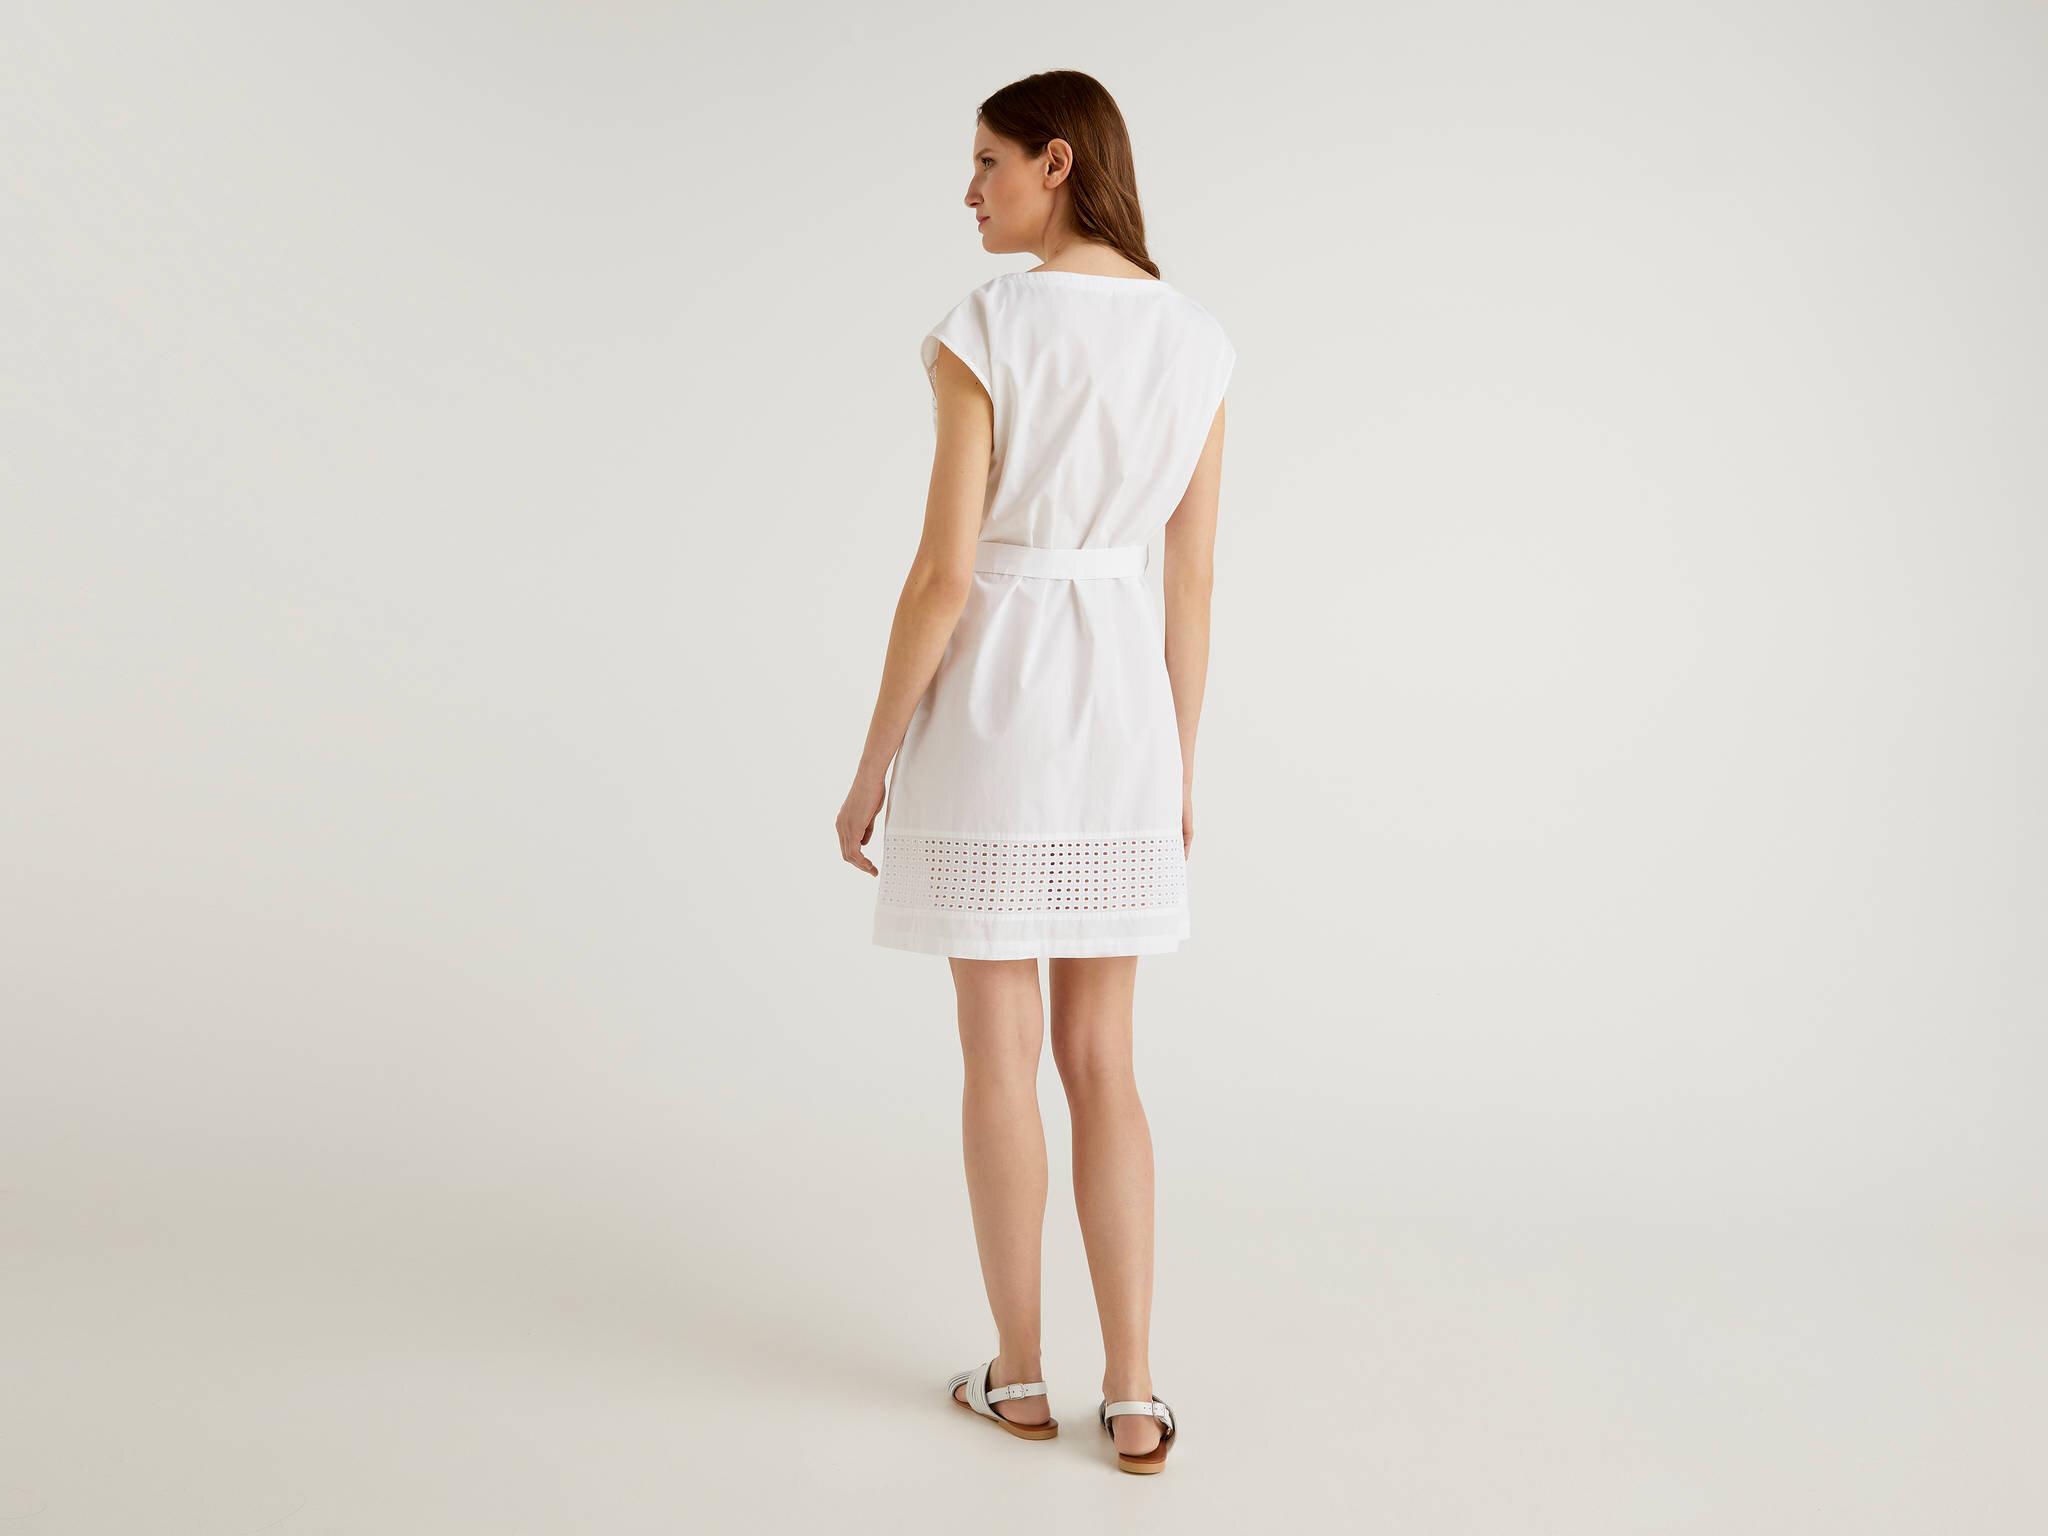 Lazer Kesikli Elbise